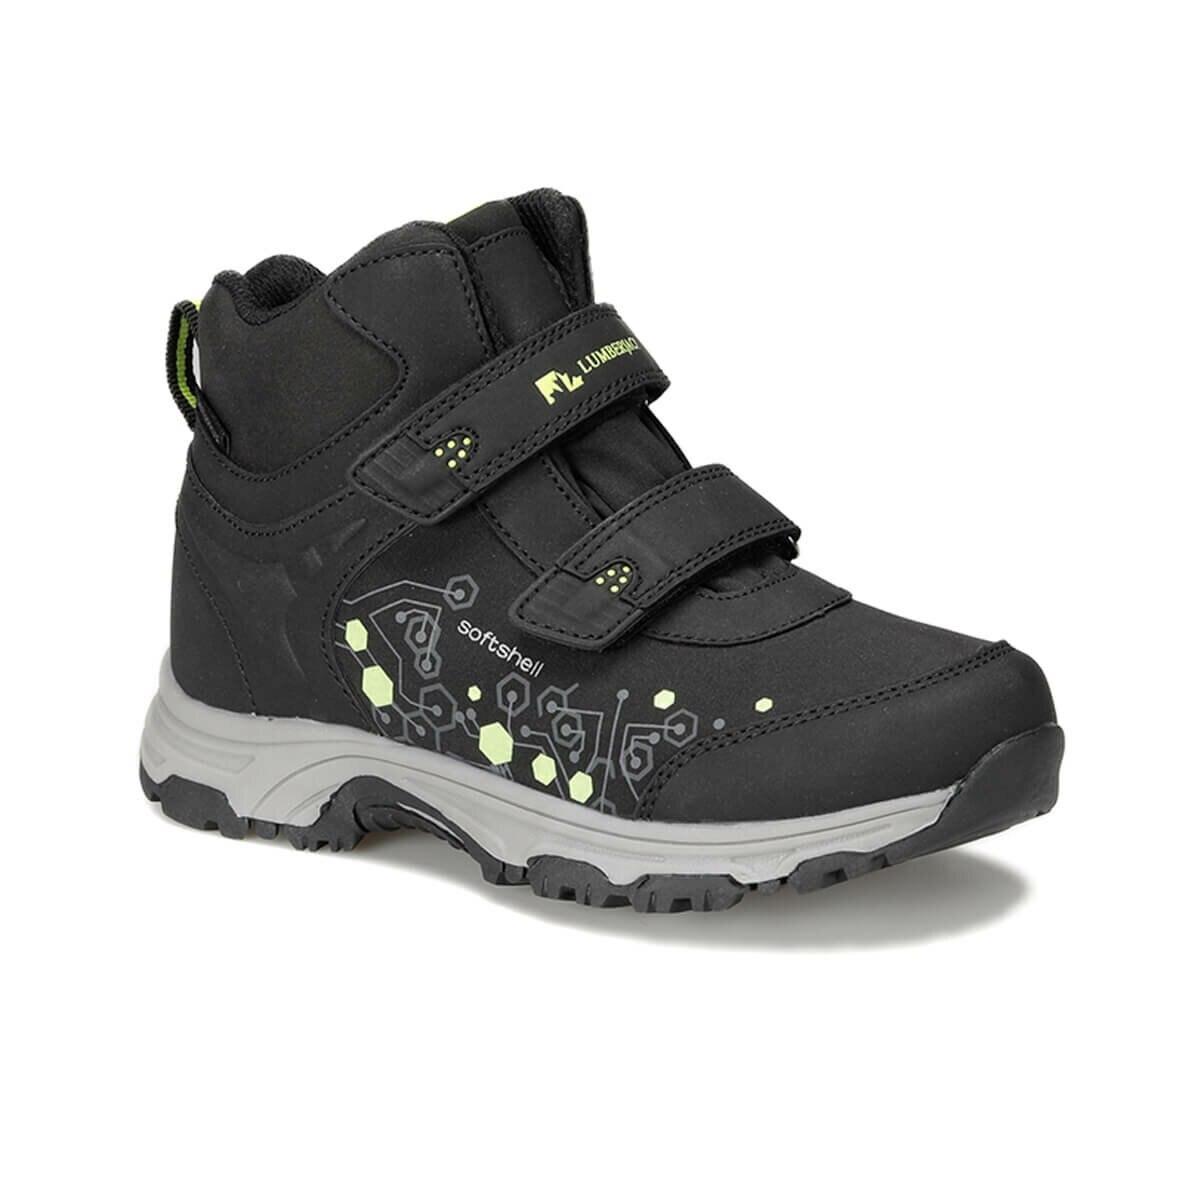 FLO SPAGO HI 9PR Black Male Child Outdoor Boots LUMBERJACK